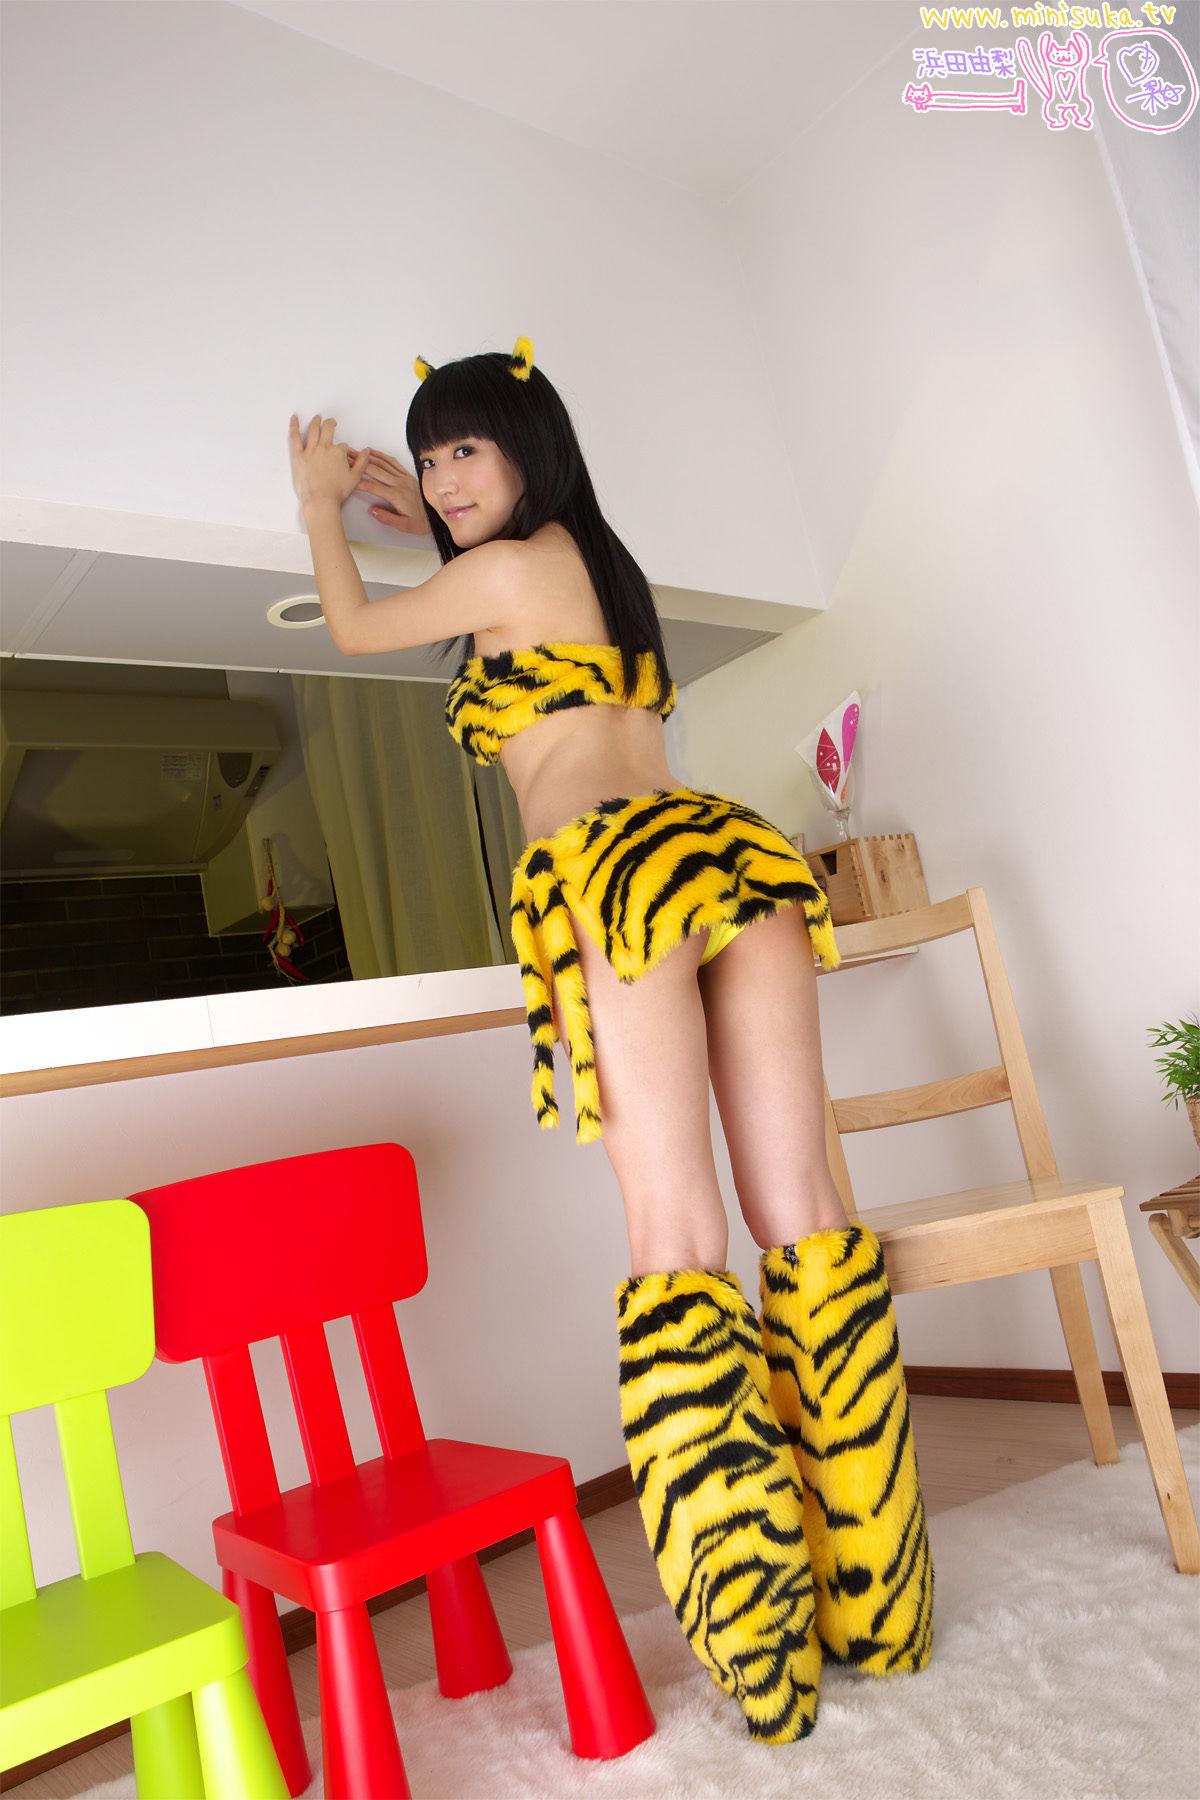 Yuri Hamada 浜田由梨 [Minisuka] Special Gallery STAGE1 4.5 写真集[37P]插图(6)